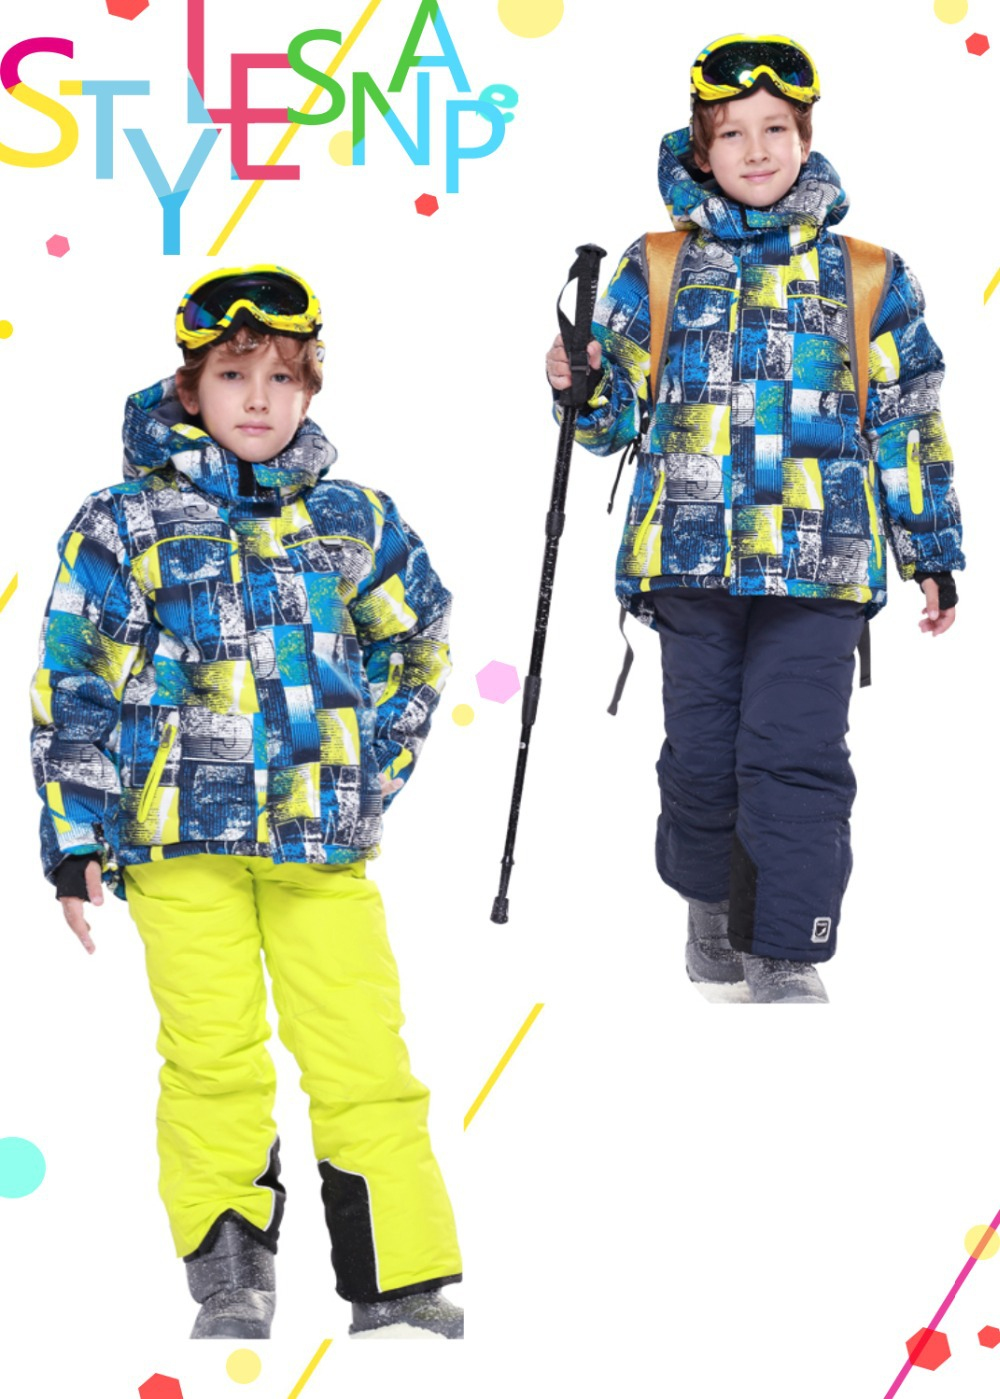 2014 new FREE SHIPPING winter Children's clothing set ski suit snowboard jacket and pants kids padding jacket skiwear 241911(China (Mainland))